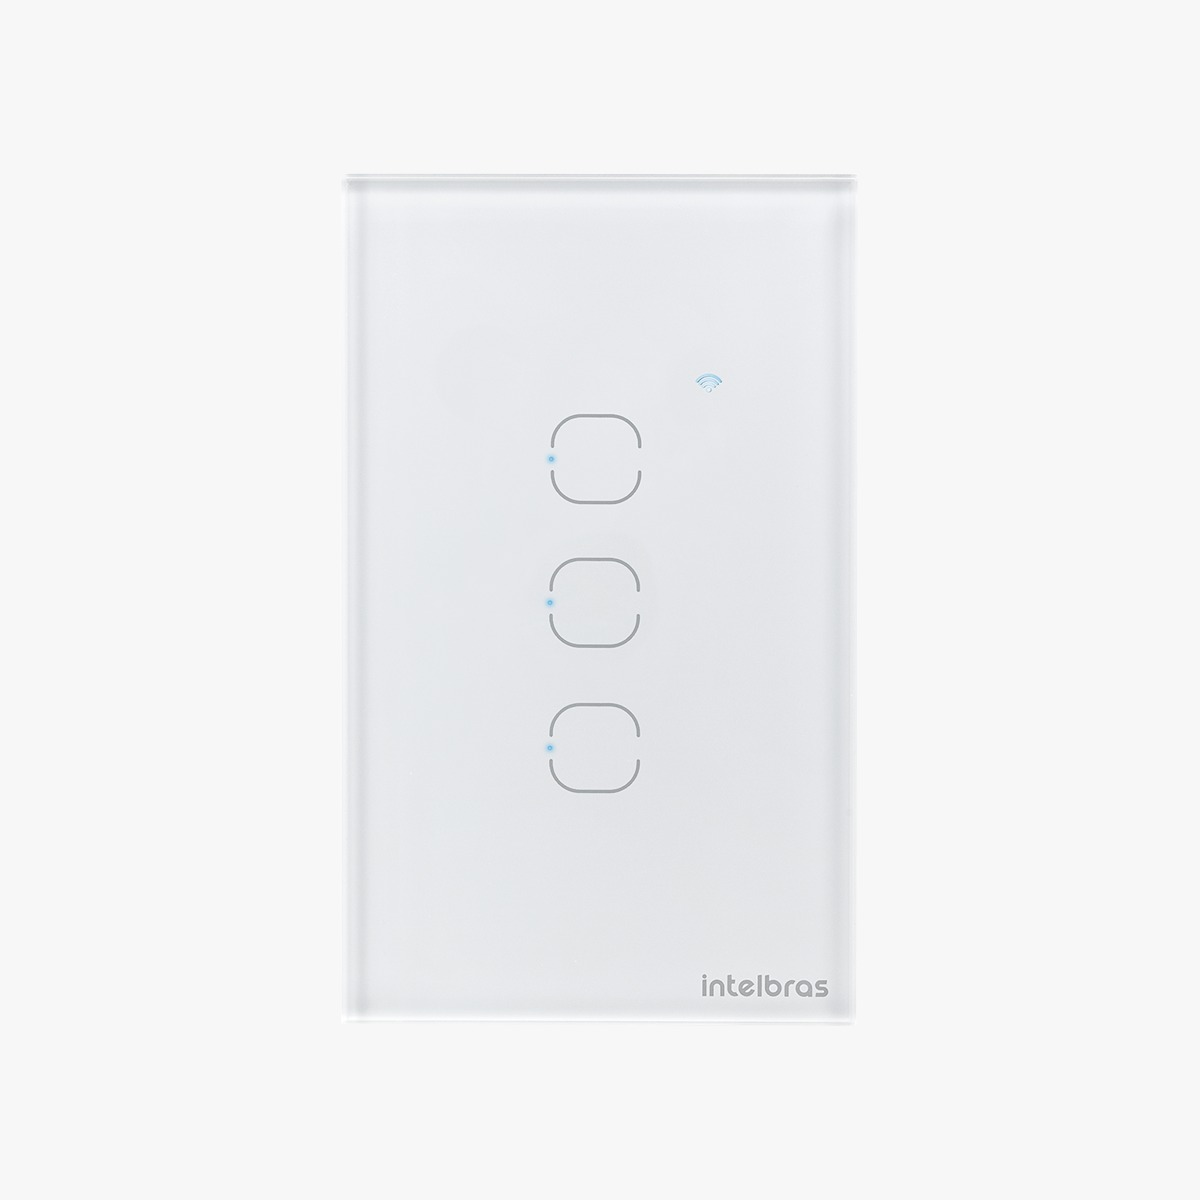 Interruptor touch smart Wi-Fi 3 Botões 4x2 Intelbras EWS 1003 branco - JS Soluções em Segurança